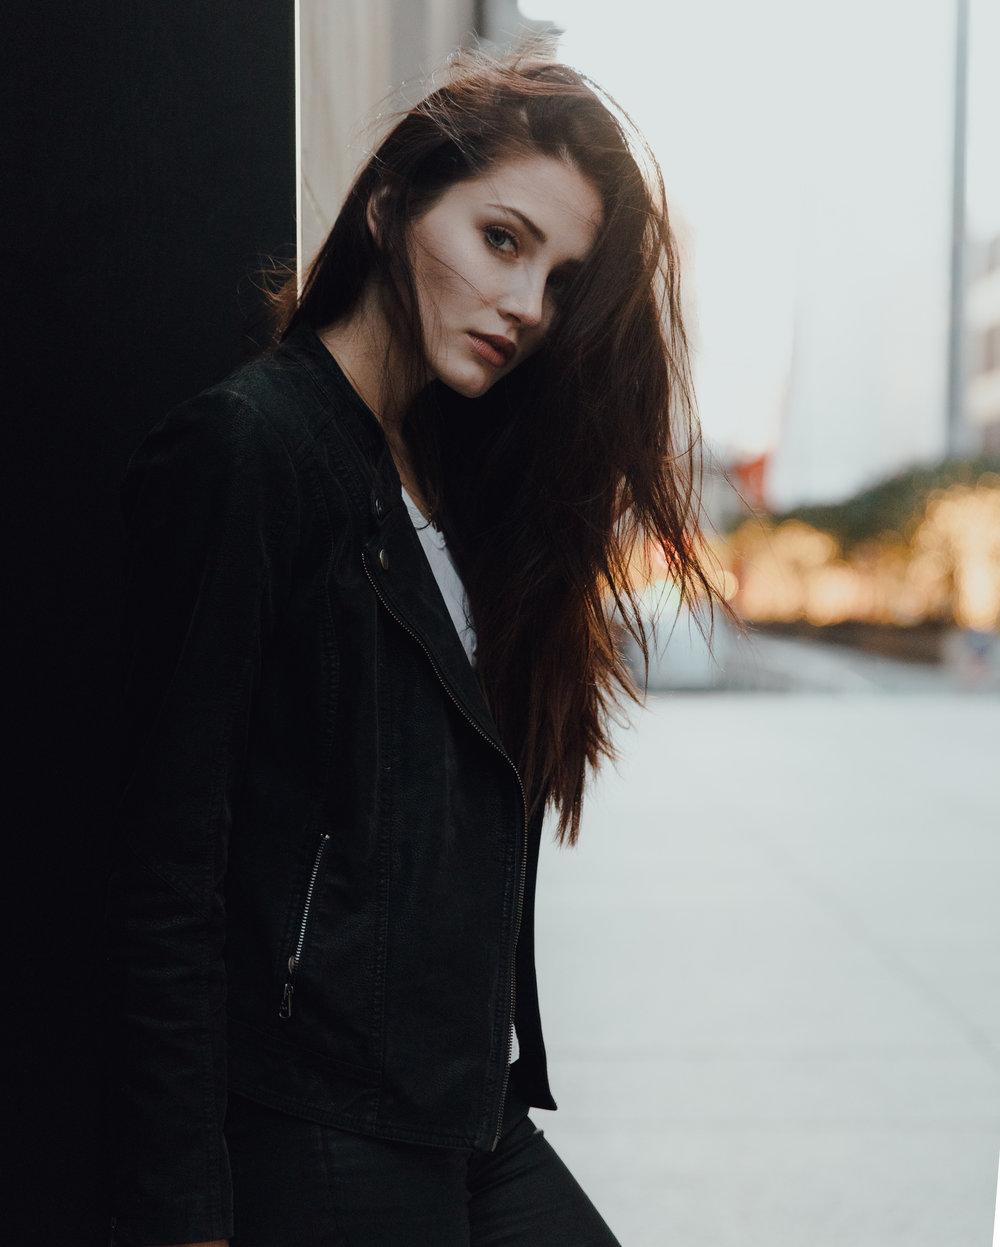 MikeSeehagel-Carly-NewYork-5D4_0215.jpg